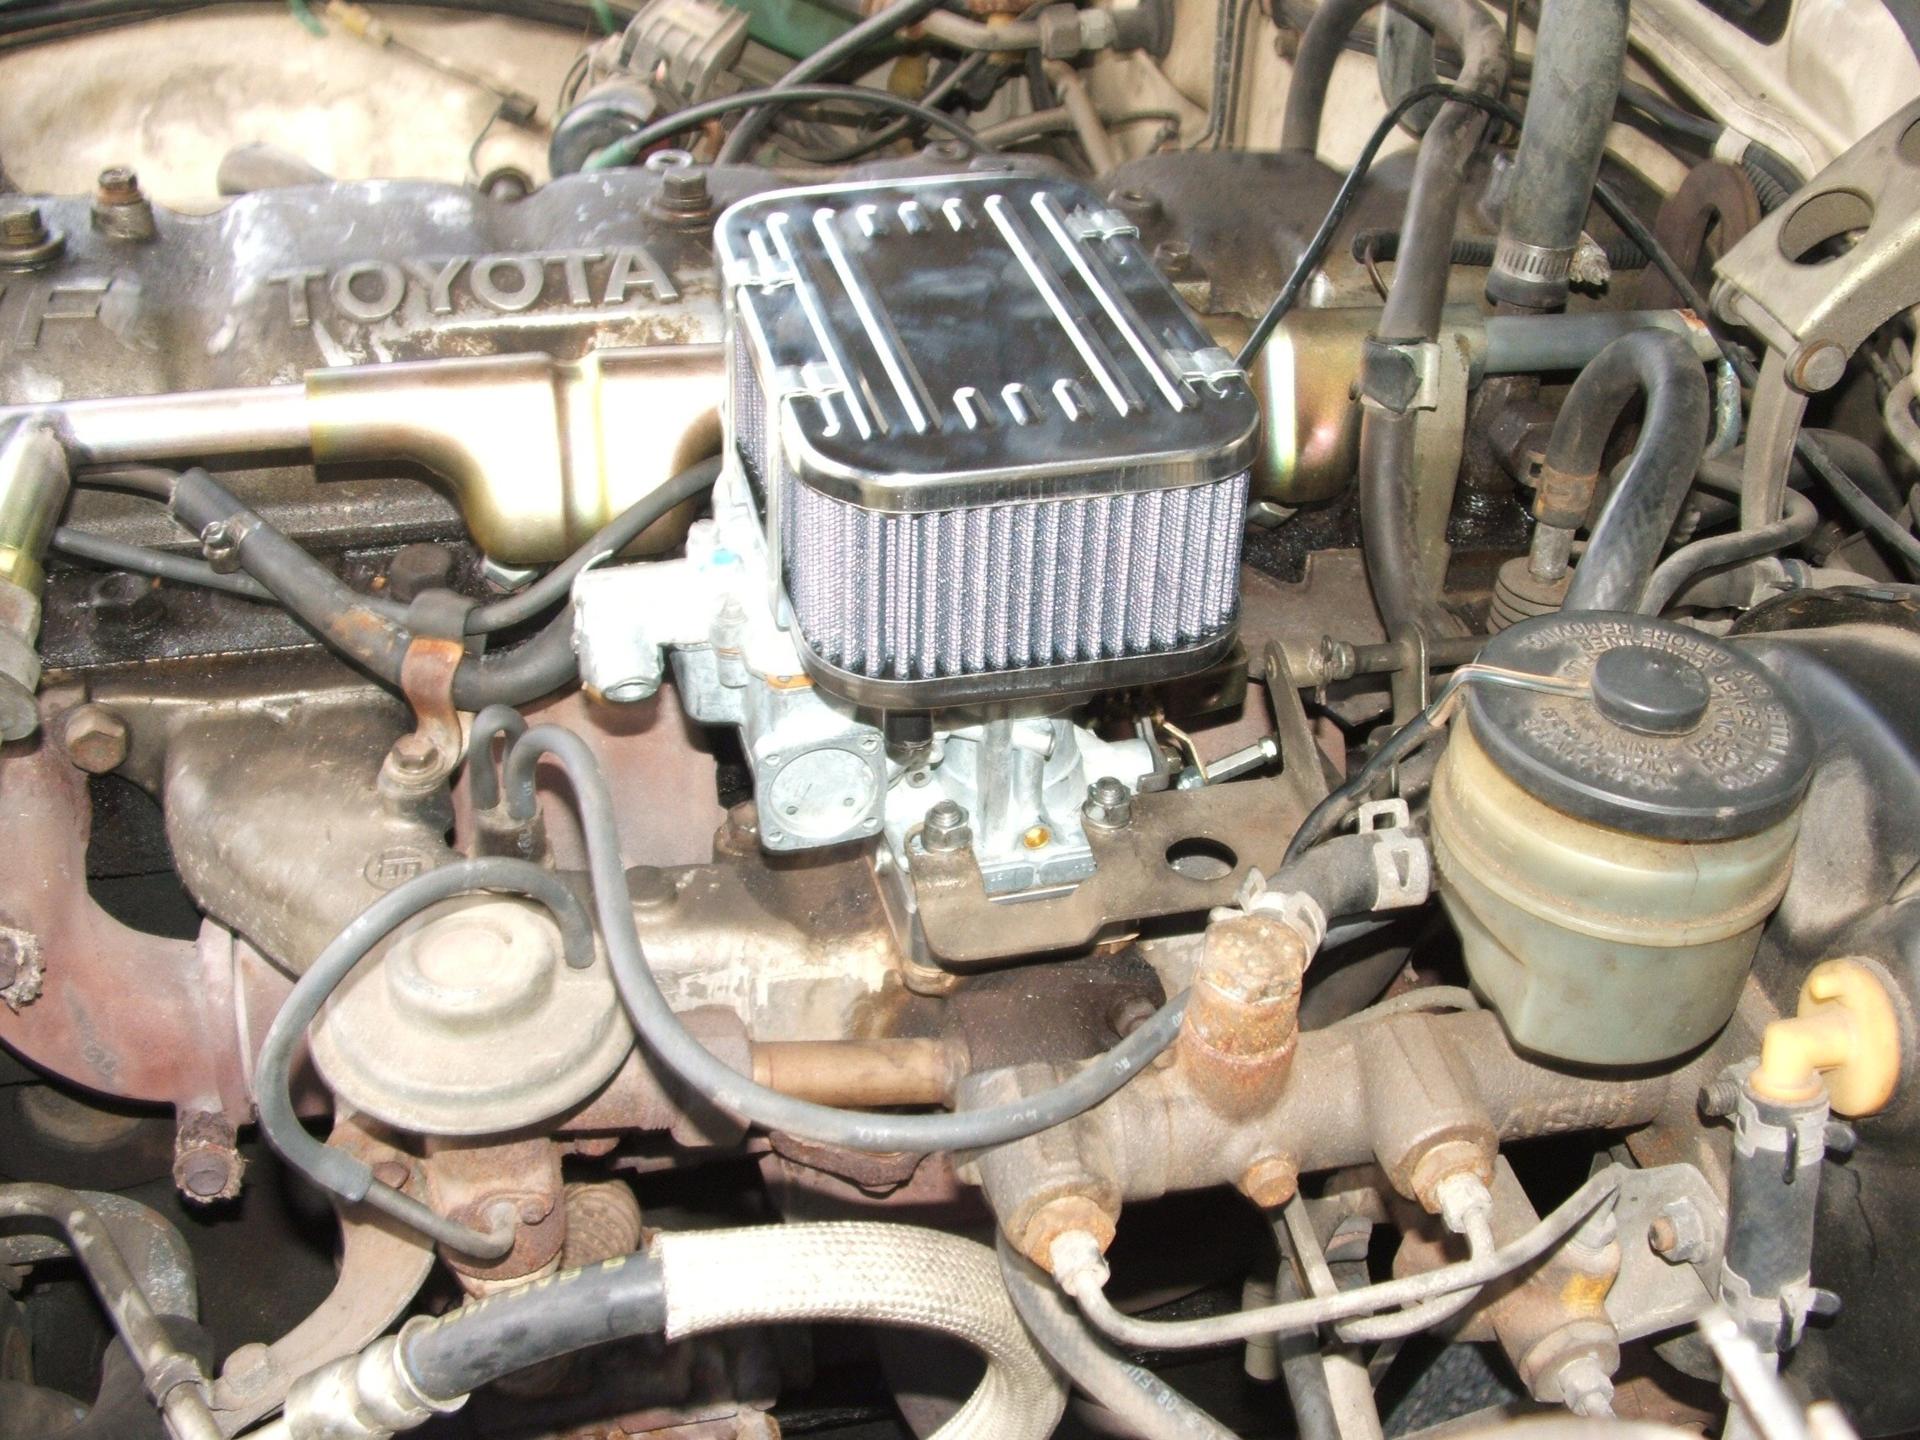 Weber Carburetor Manifold Adapter for Toyota Land Cruiser 1F 2F FJ40 FJ60